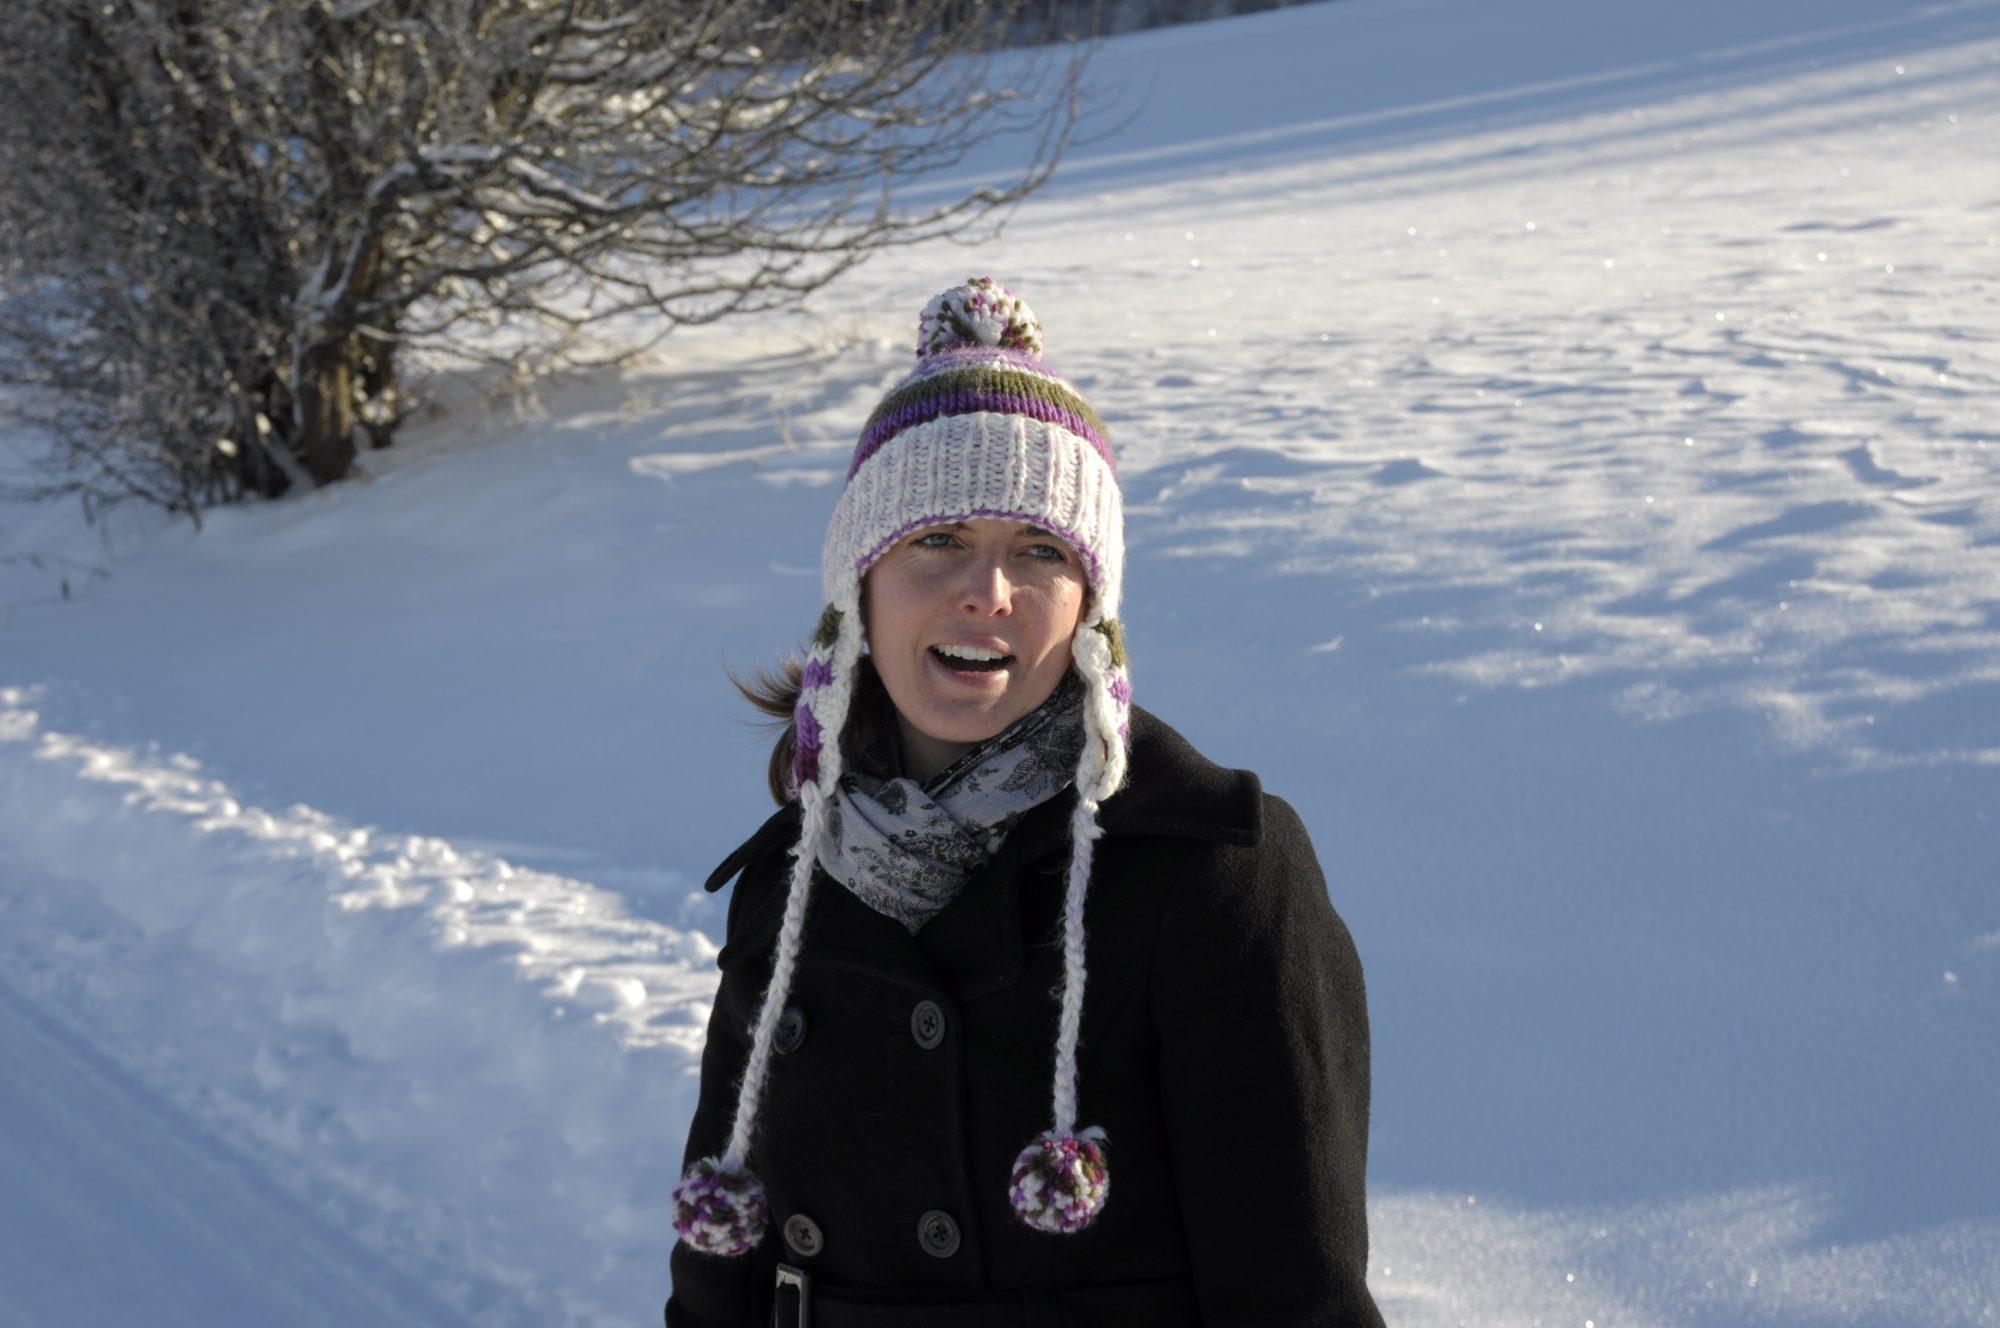 Dezember 2010 - Luisa Bommelmütze